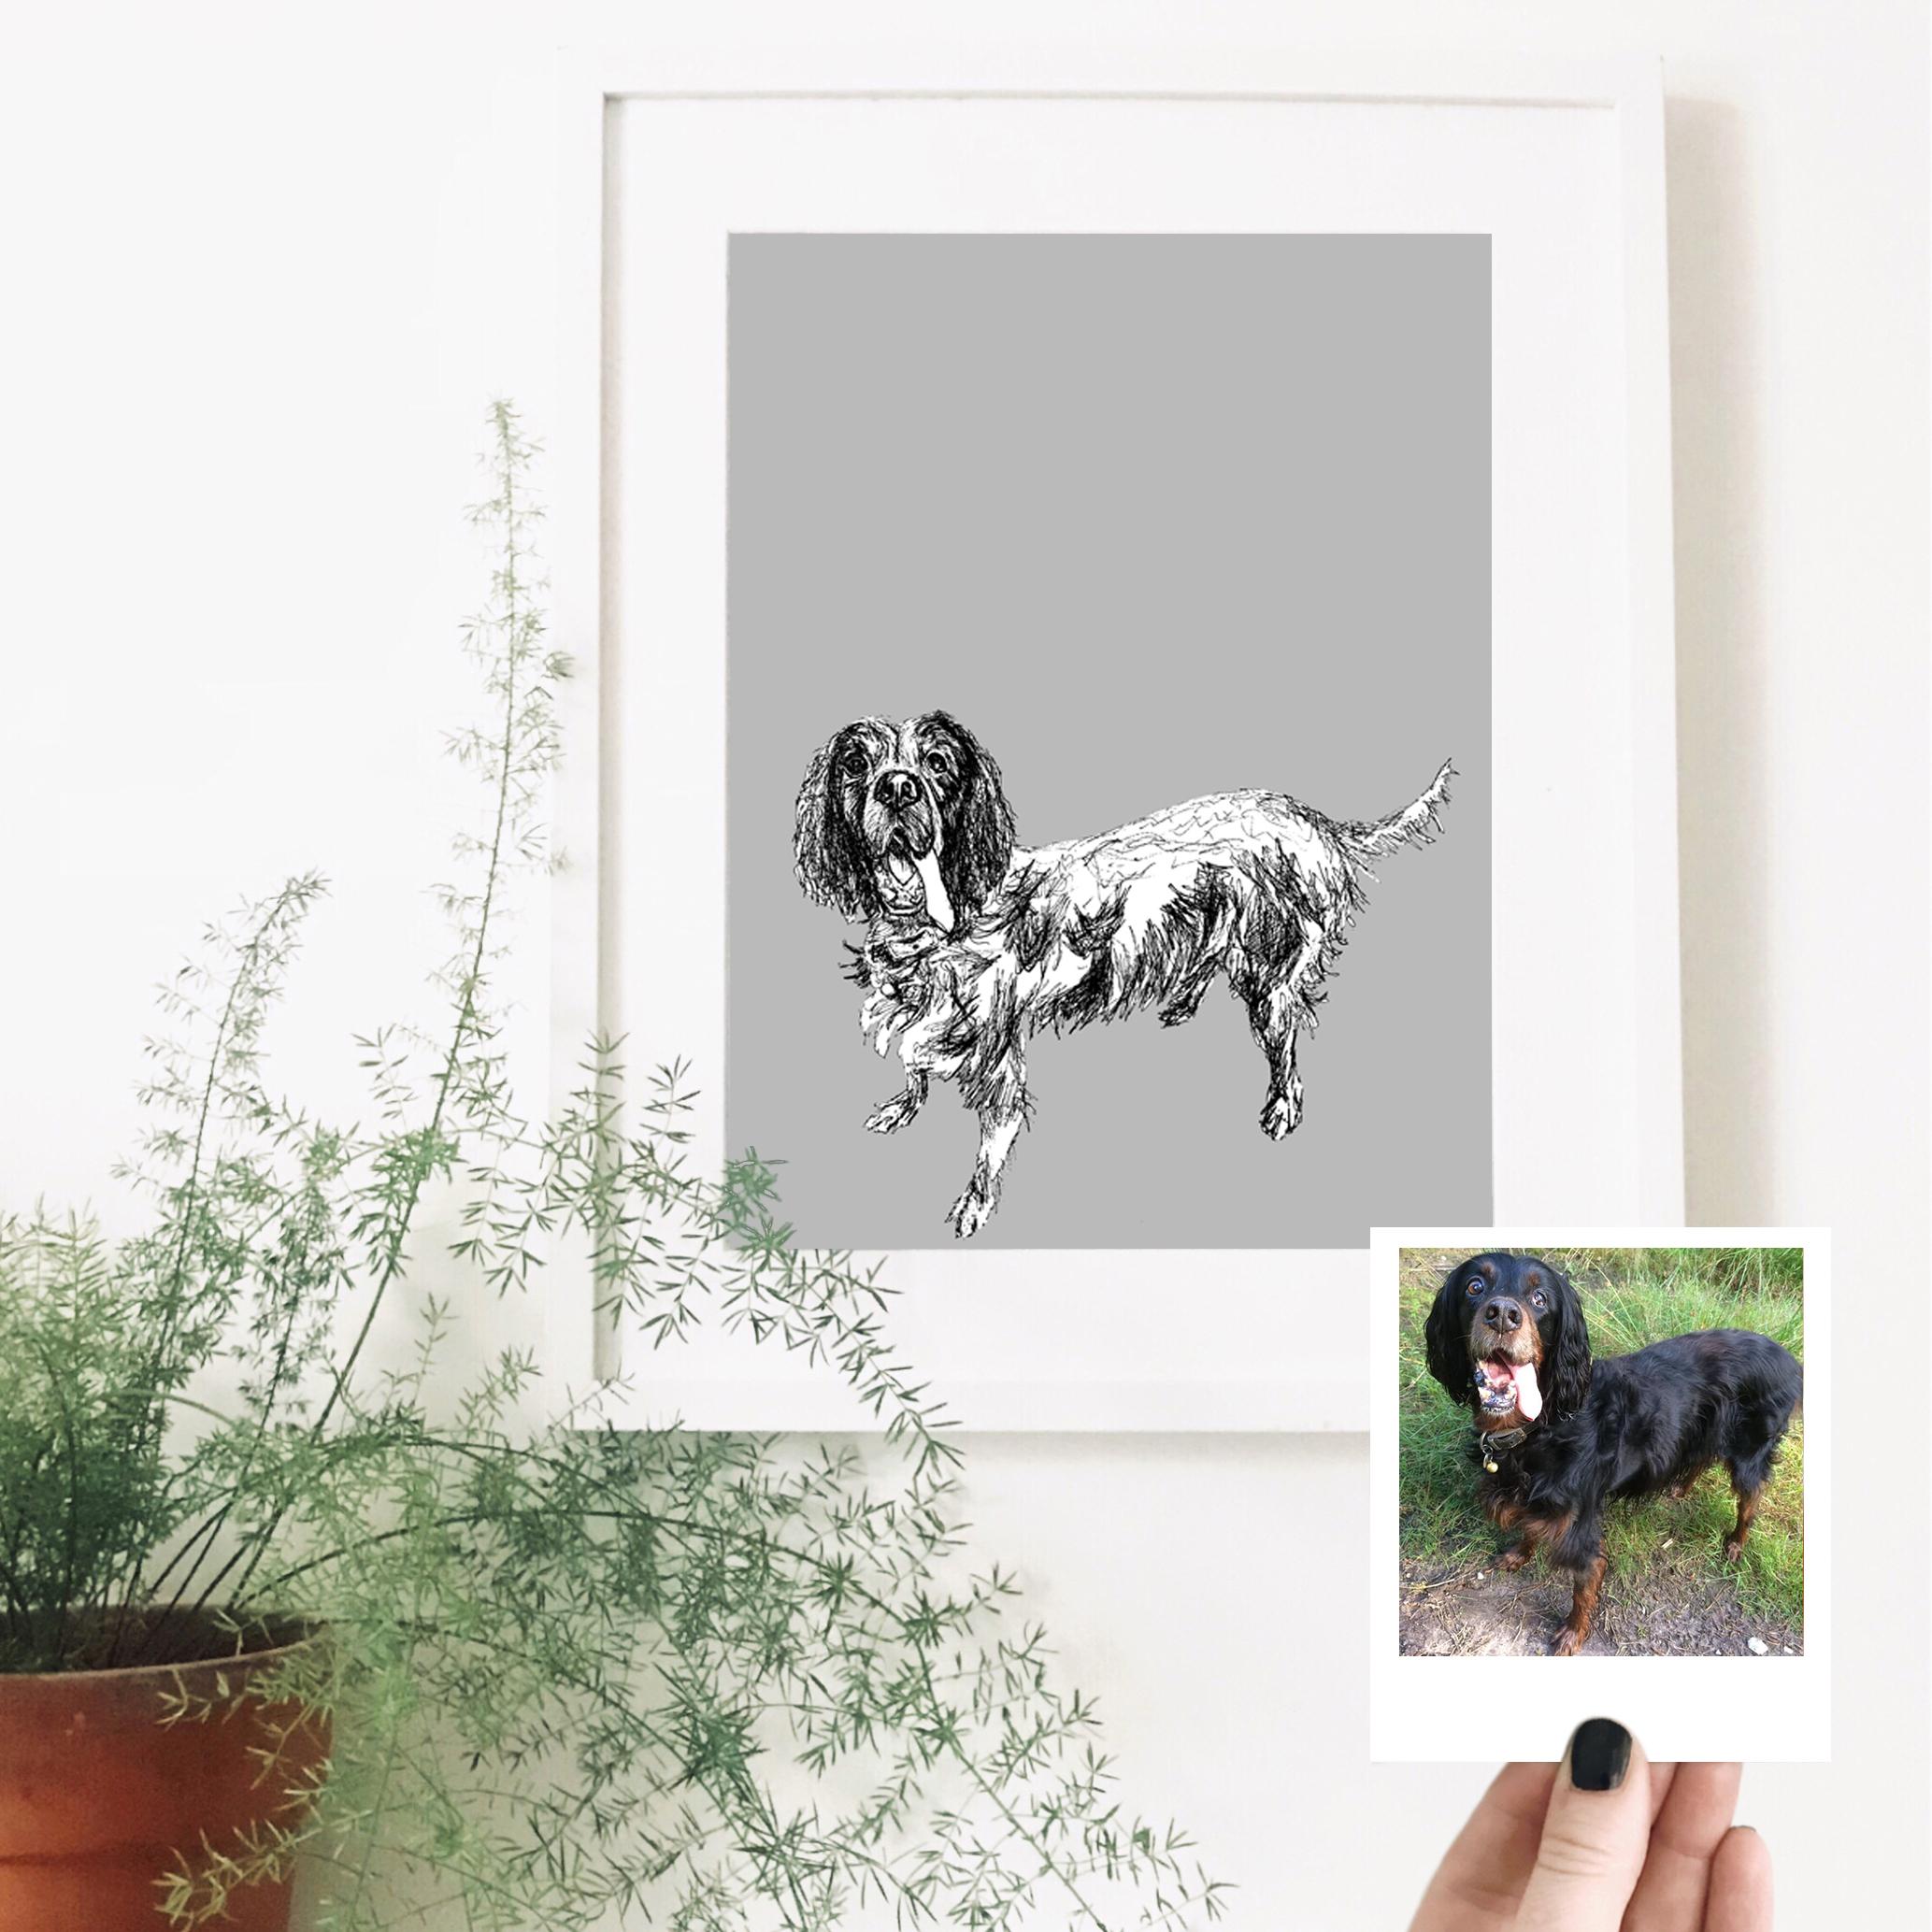 nick-dog-pet-portrait-drawing.jpg